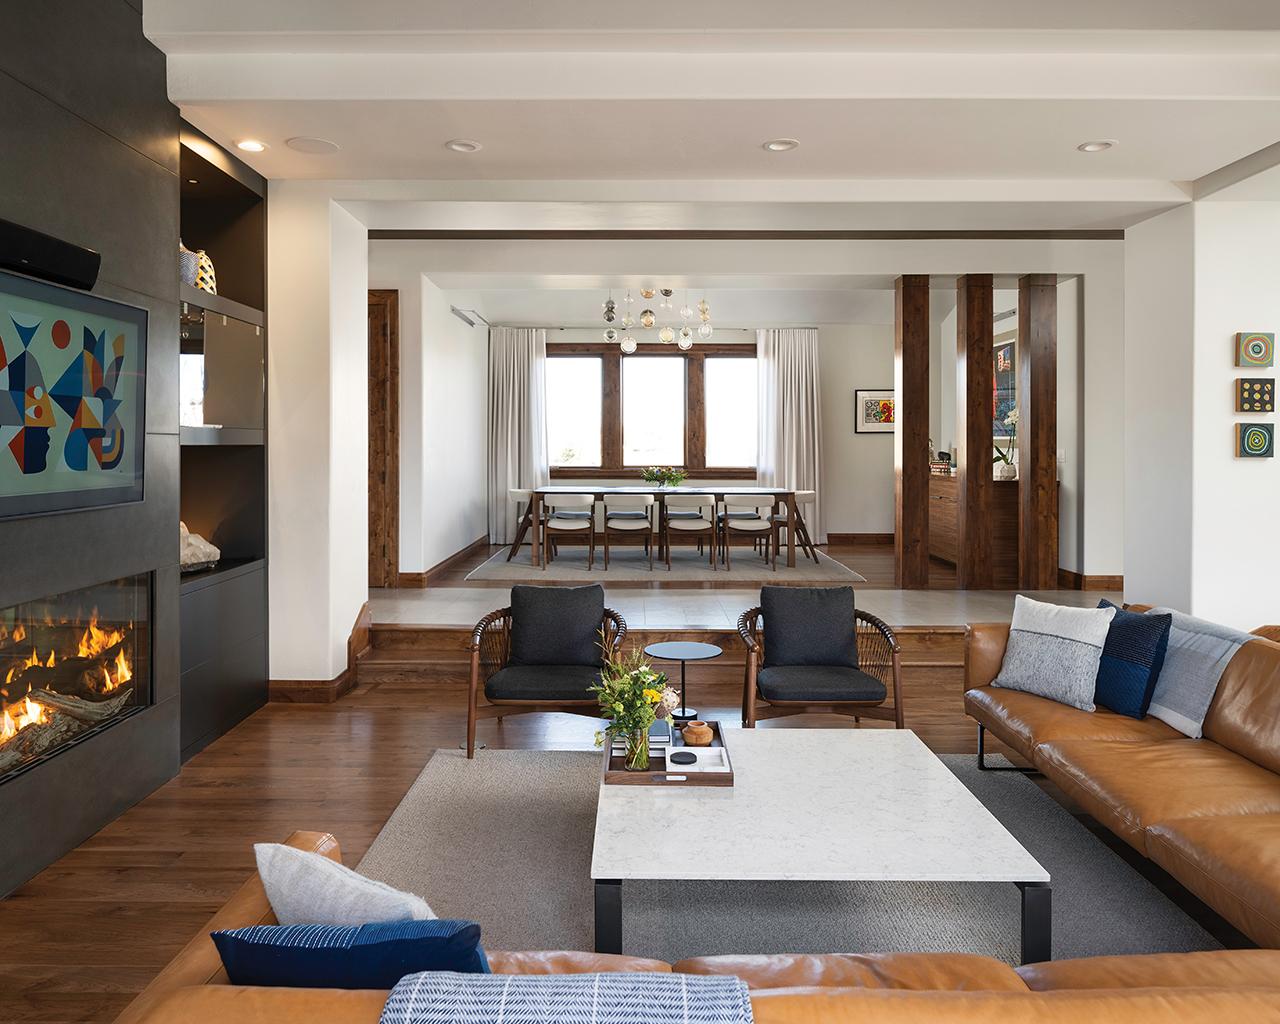 Rodwin_PrairiePl-Livingroom-Diningroom-4x5Crop-2 CMYK